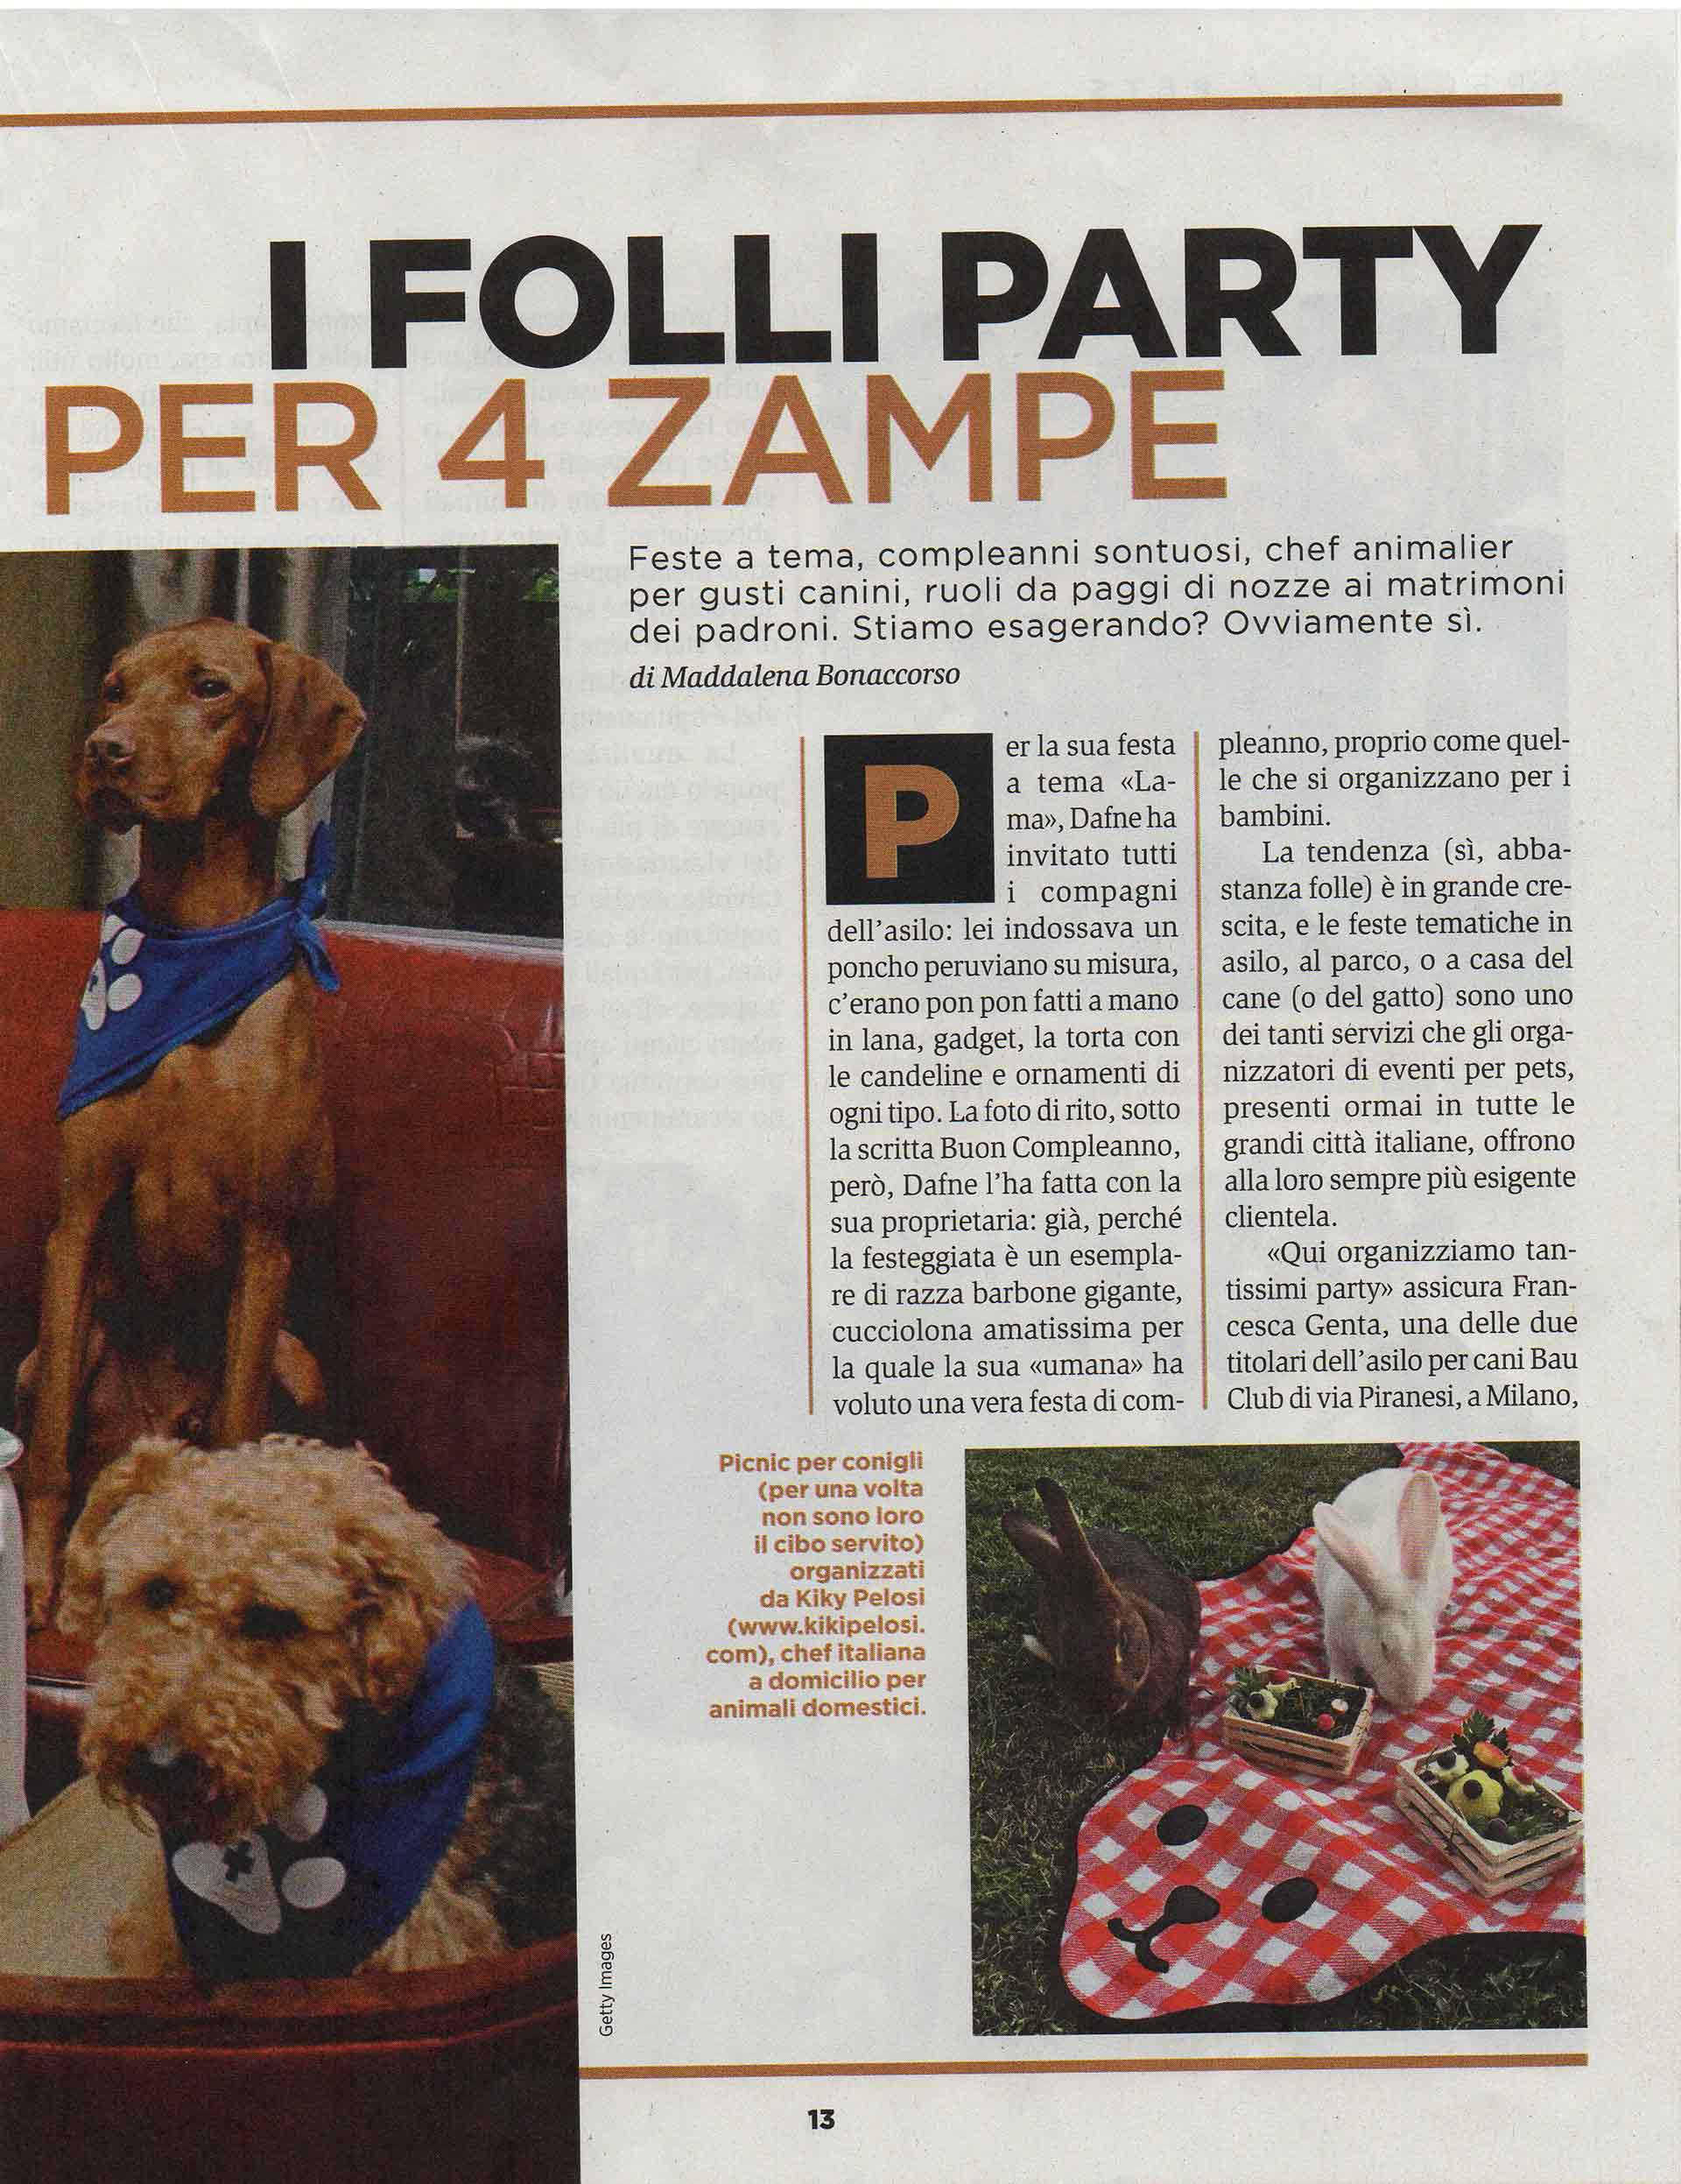 panorama-rivista-bauclub-asilo-educazione-cani-milano-02